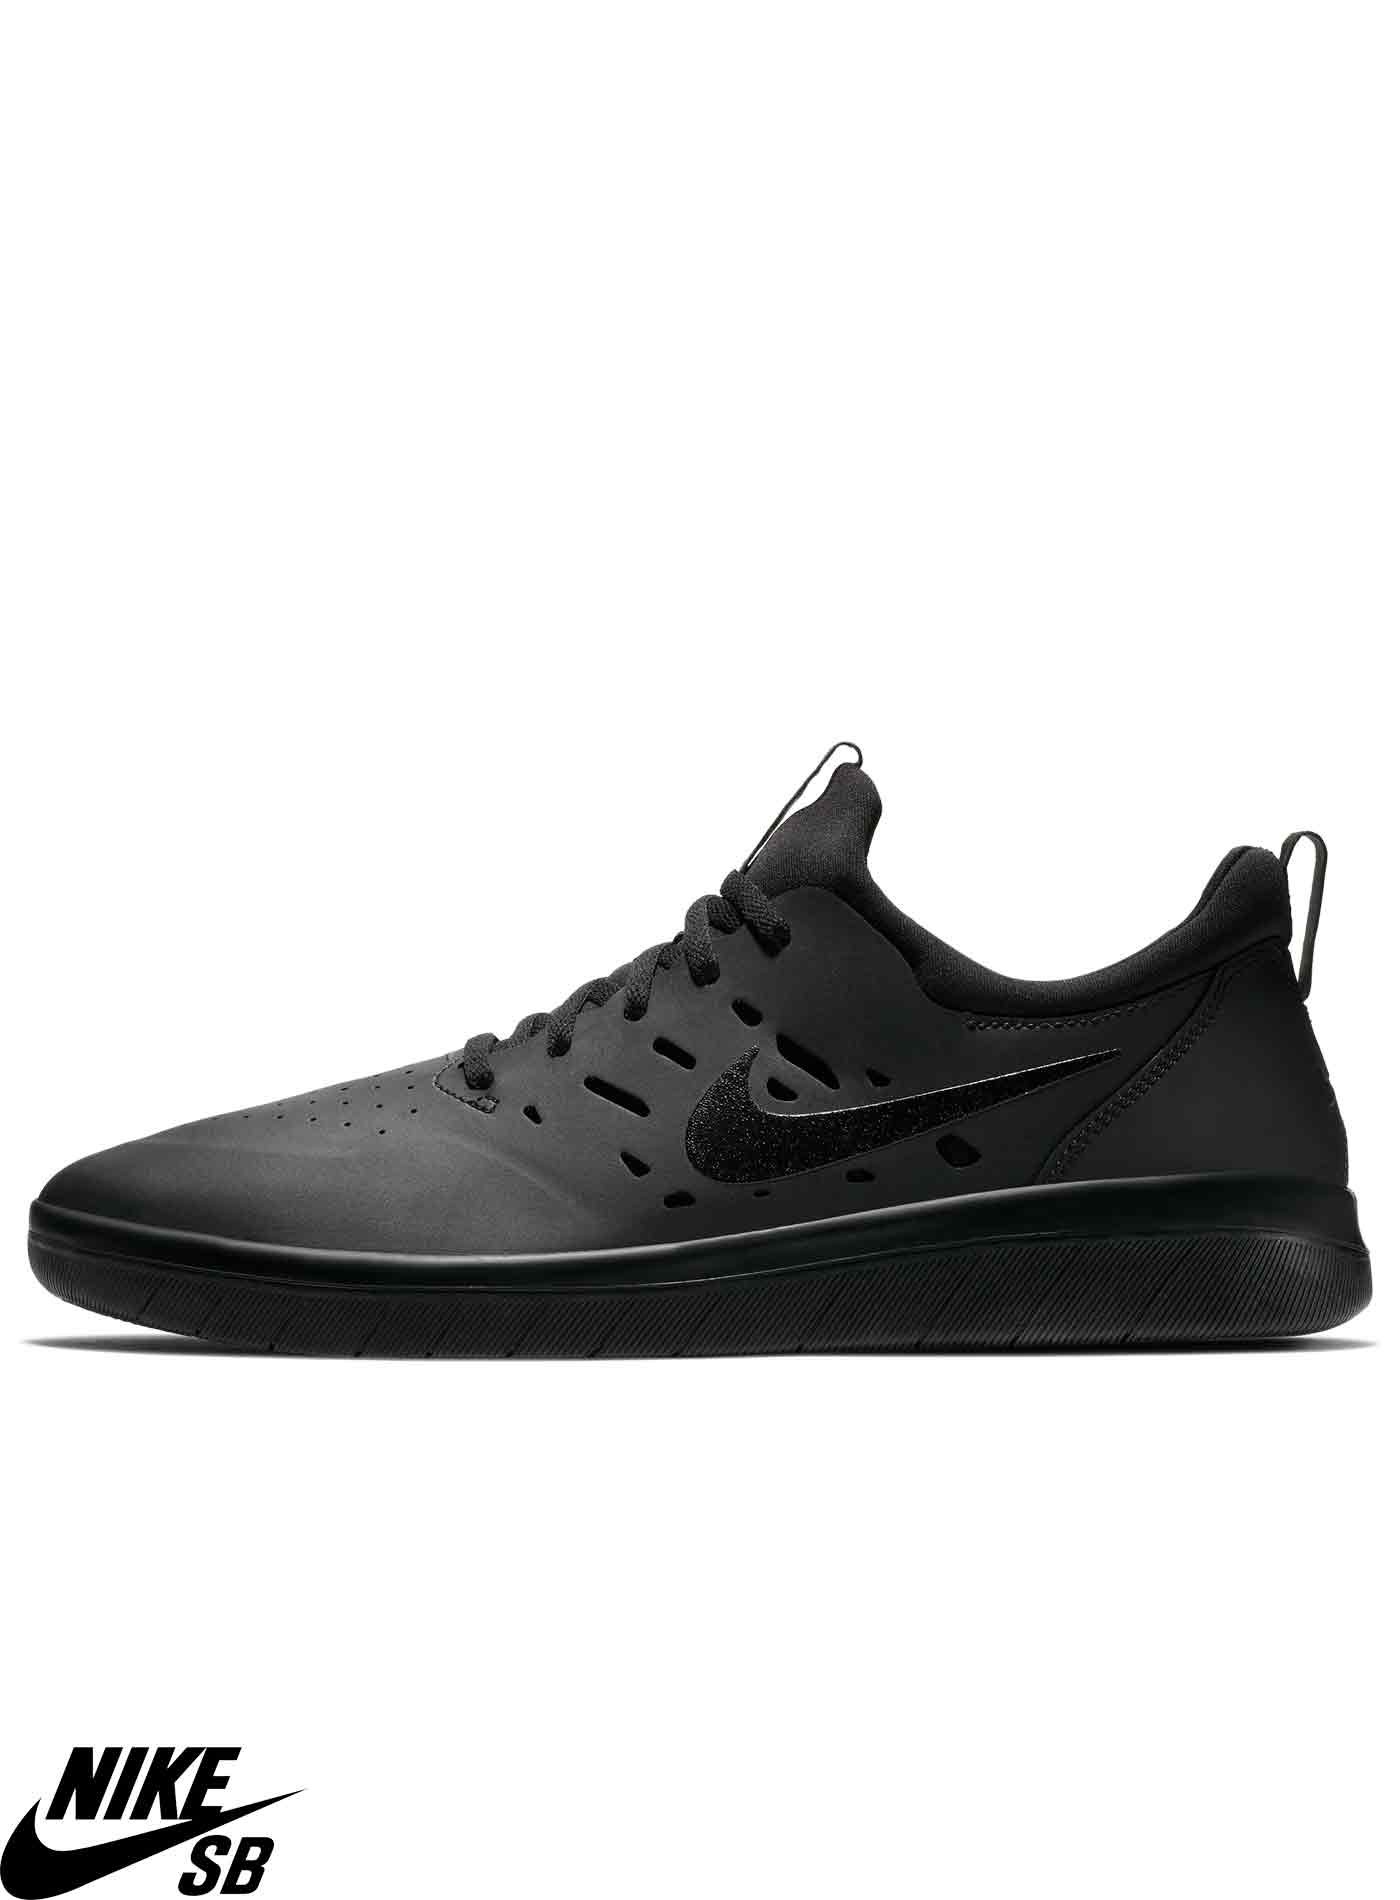 100% authentic 84ff4 f95e7 Chaussures Skate Nike SB Nyjah Free Skateboarding Noir